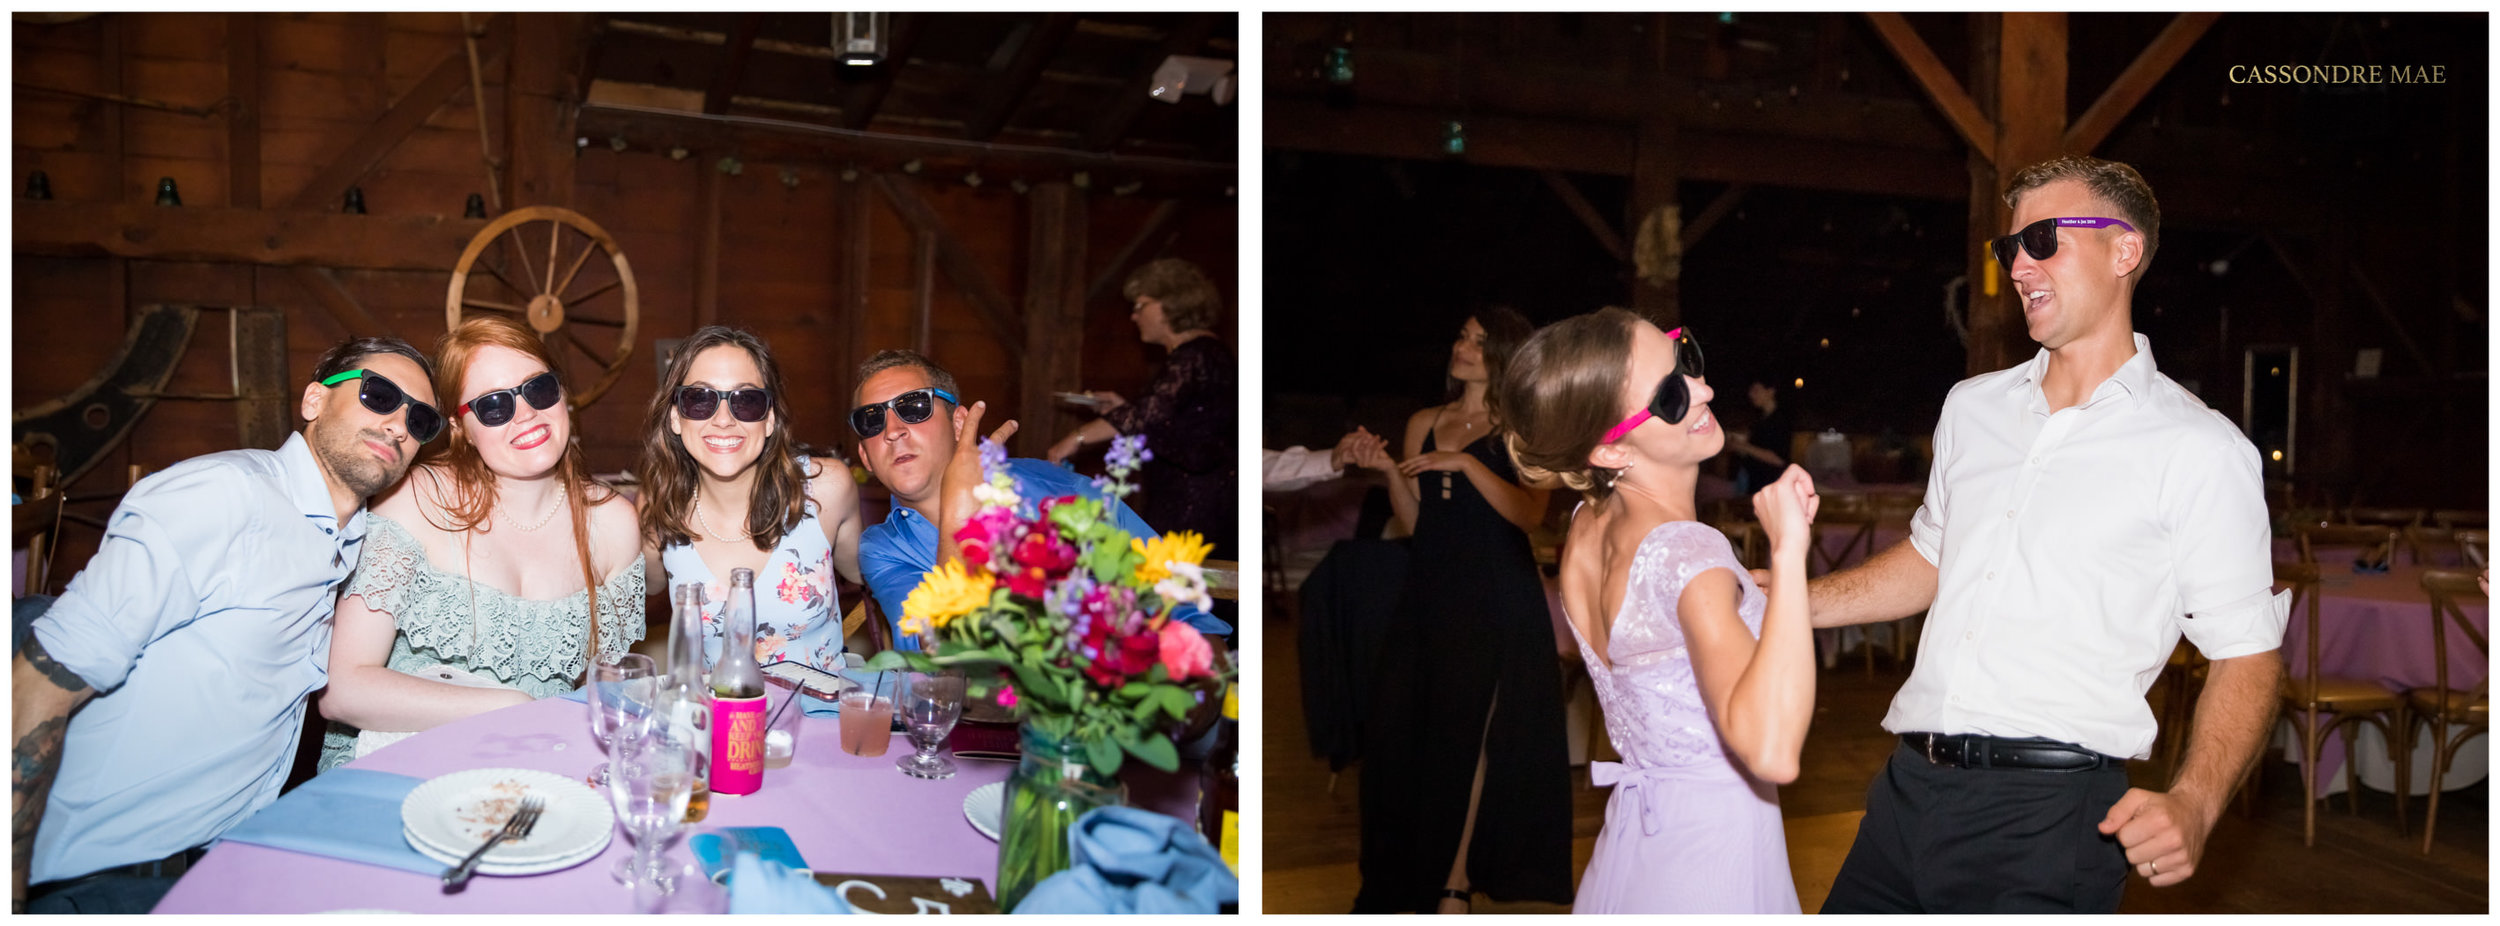 Cassondre Mae Photography hudson valley barn weddings -22.jpg